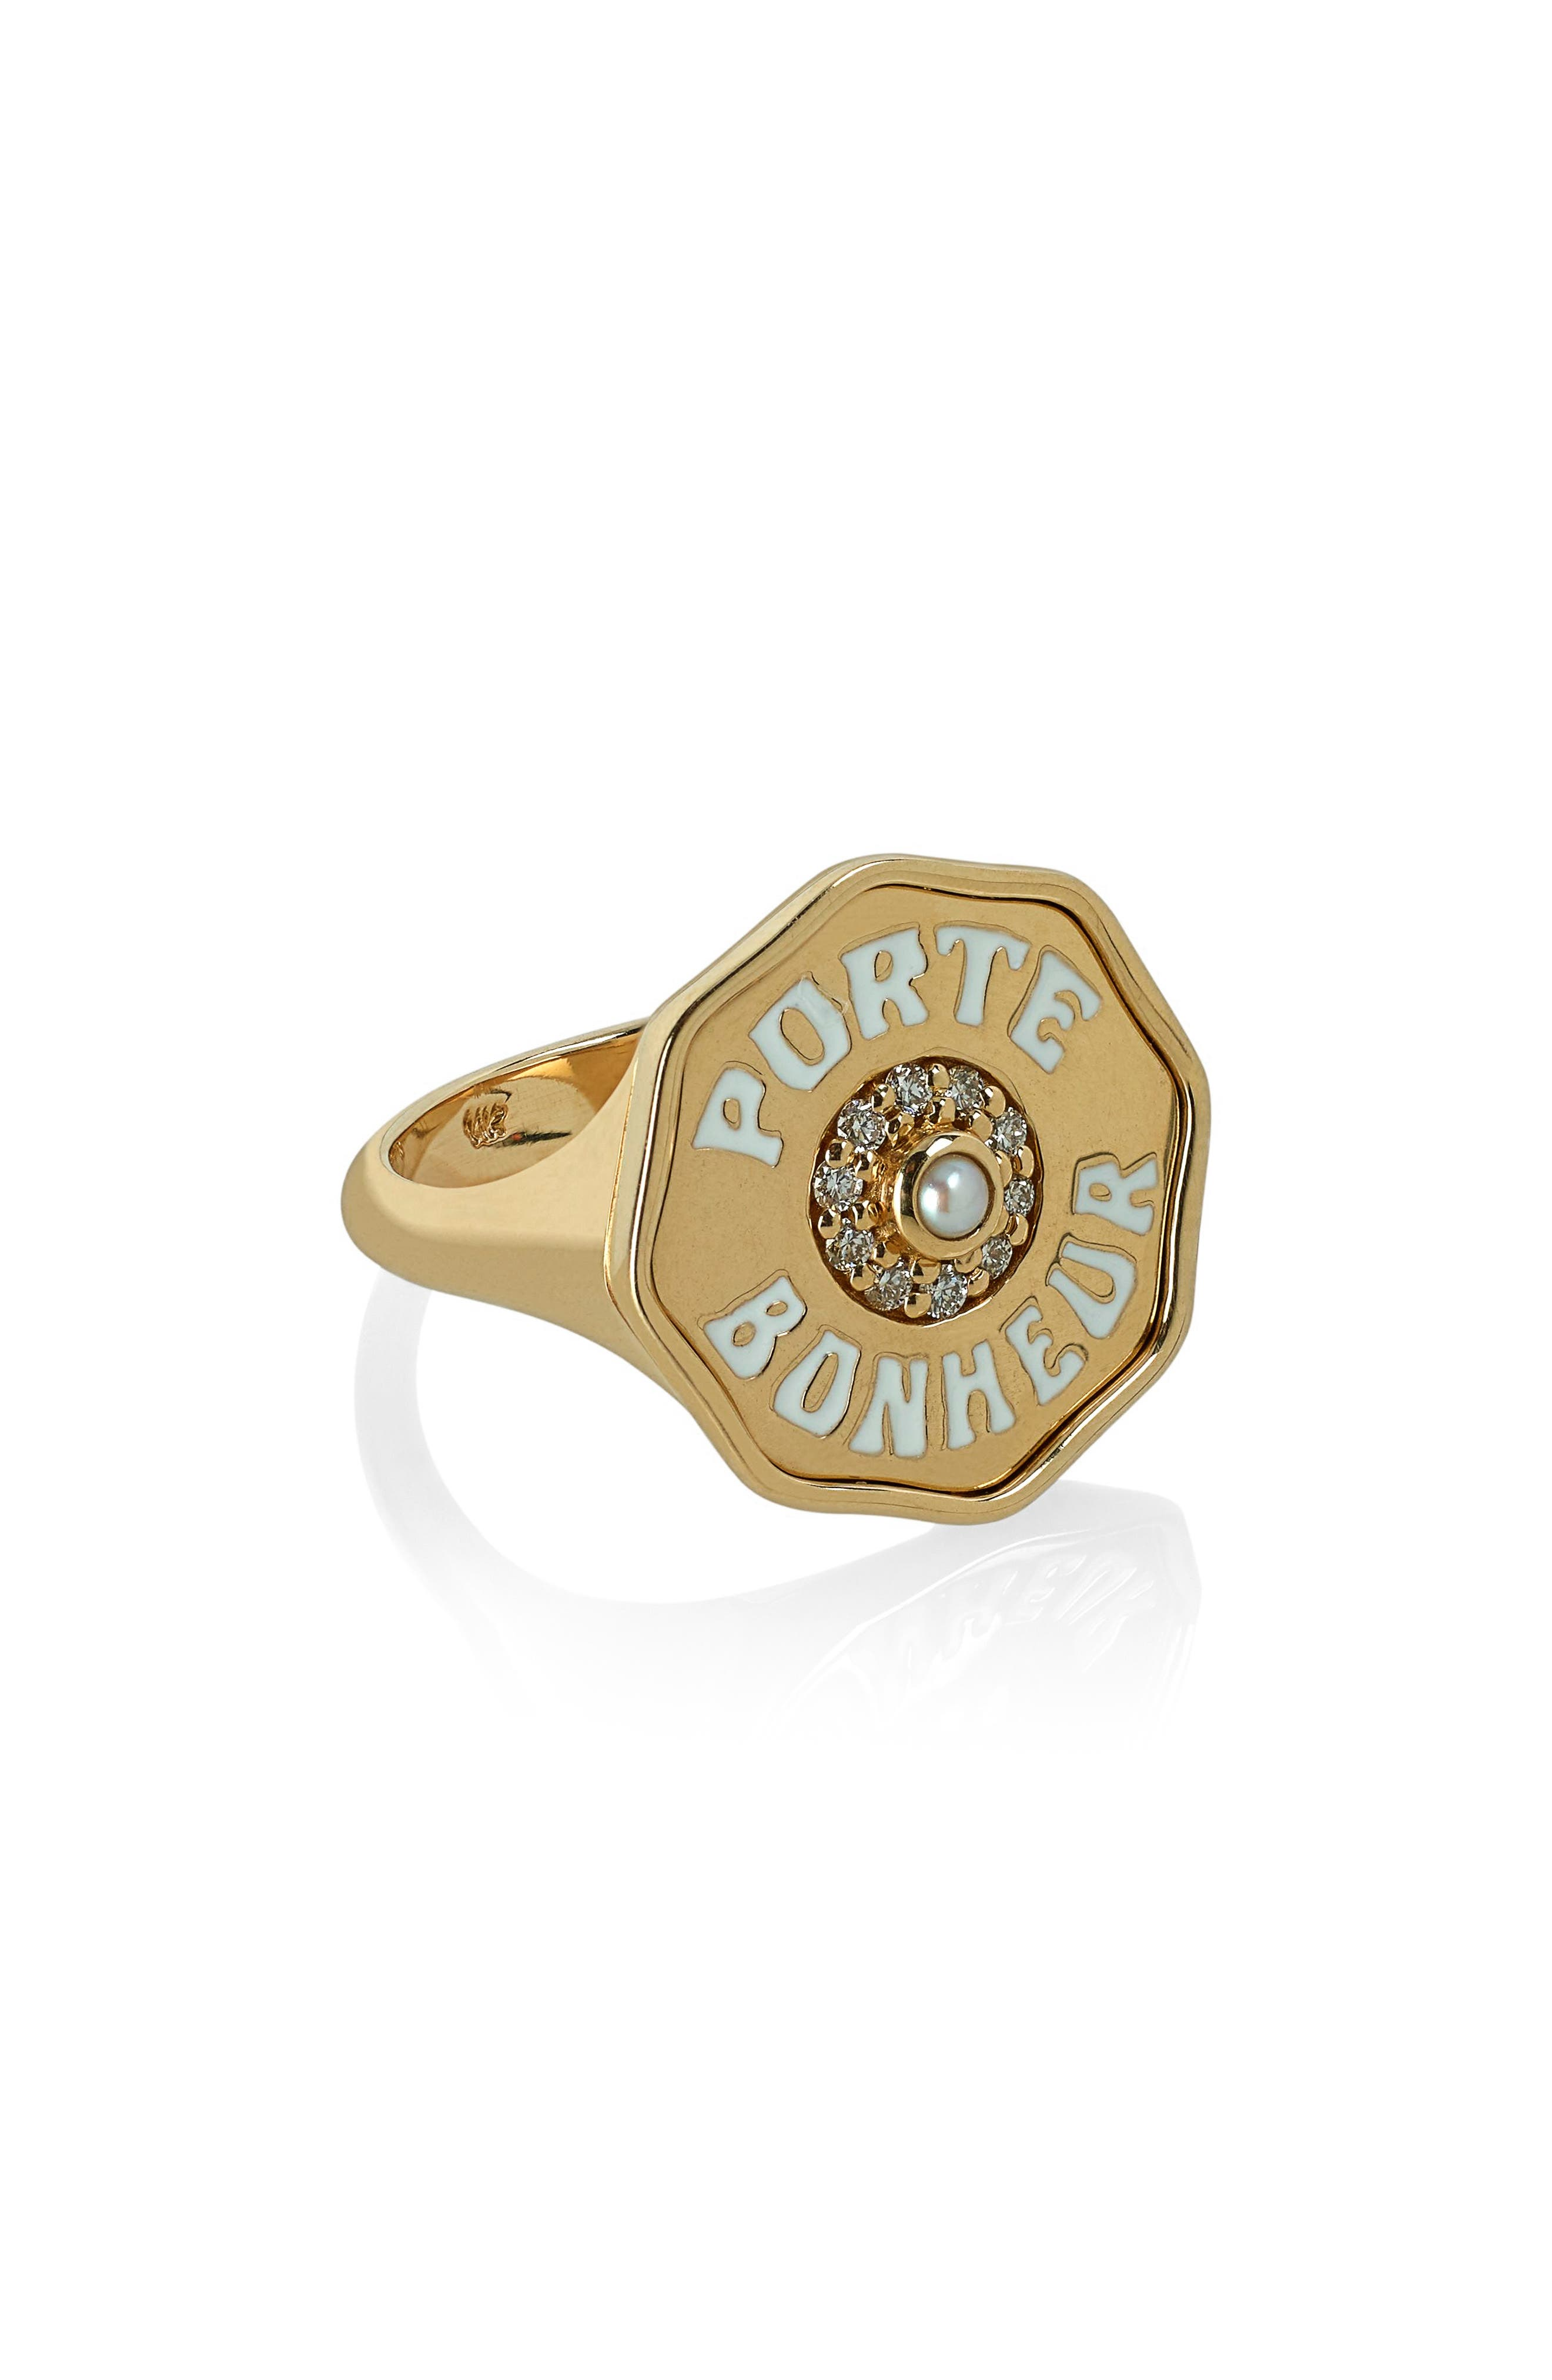 Porte Bonhuer Coin Ring,                         Main,                         color, YELLOW GOLD